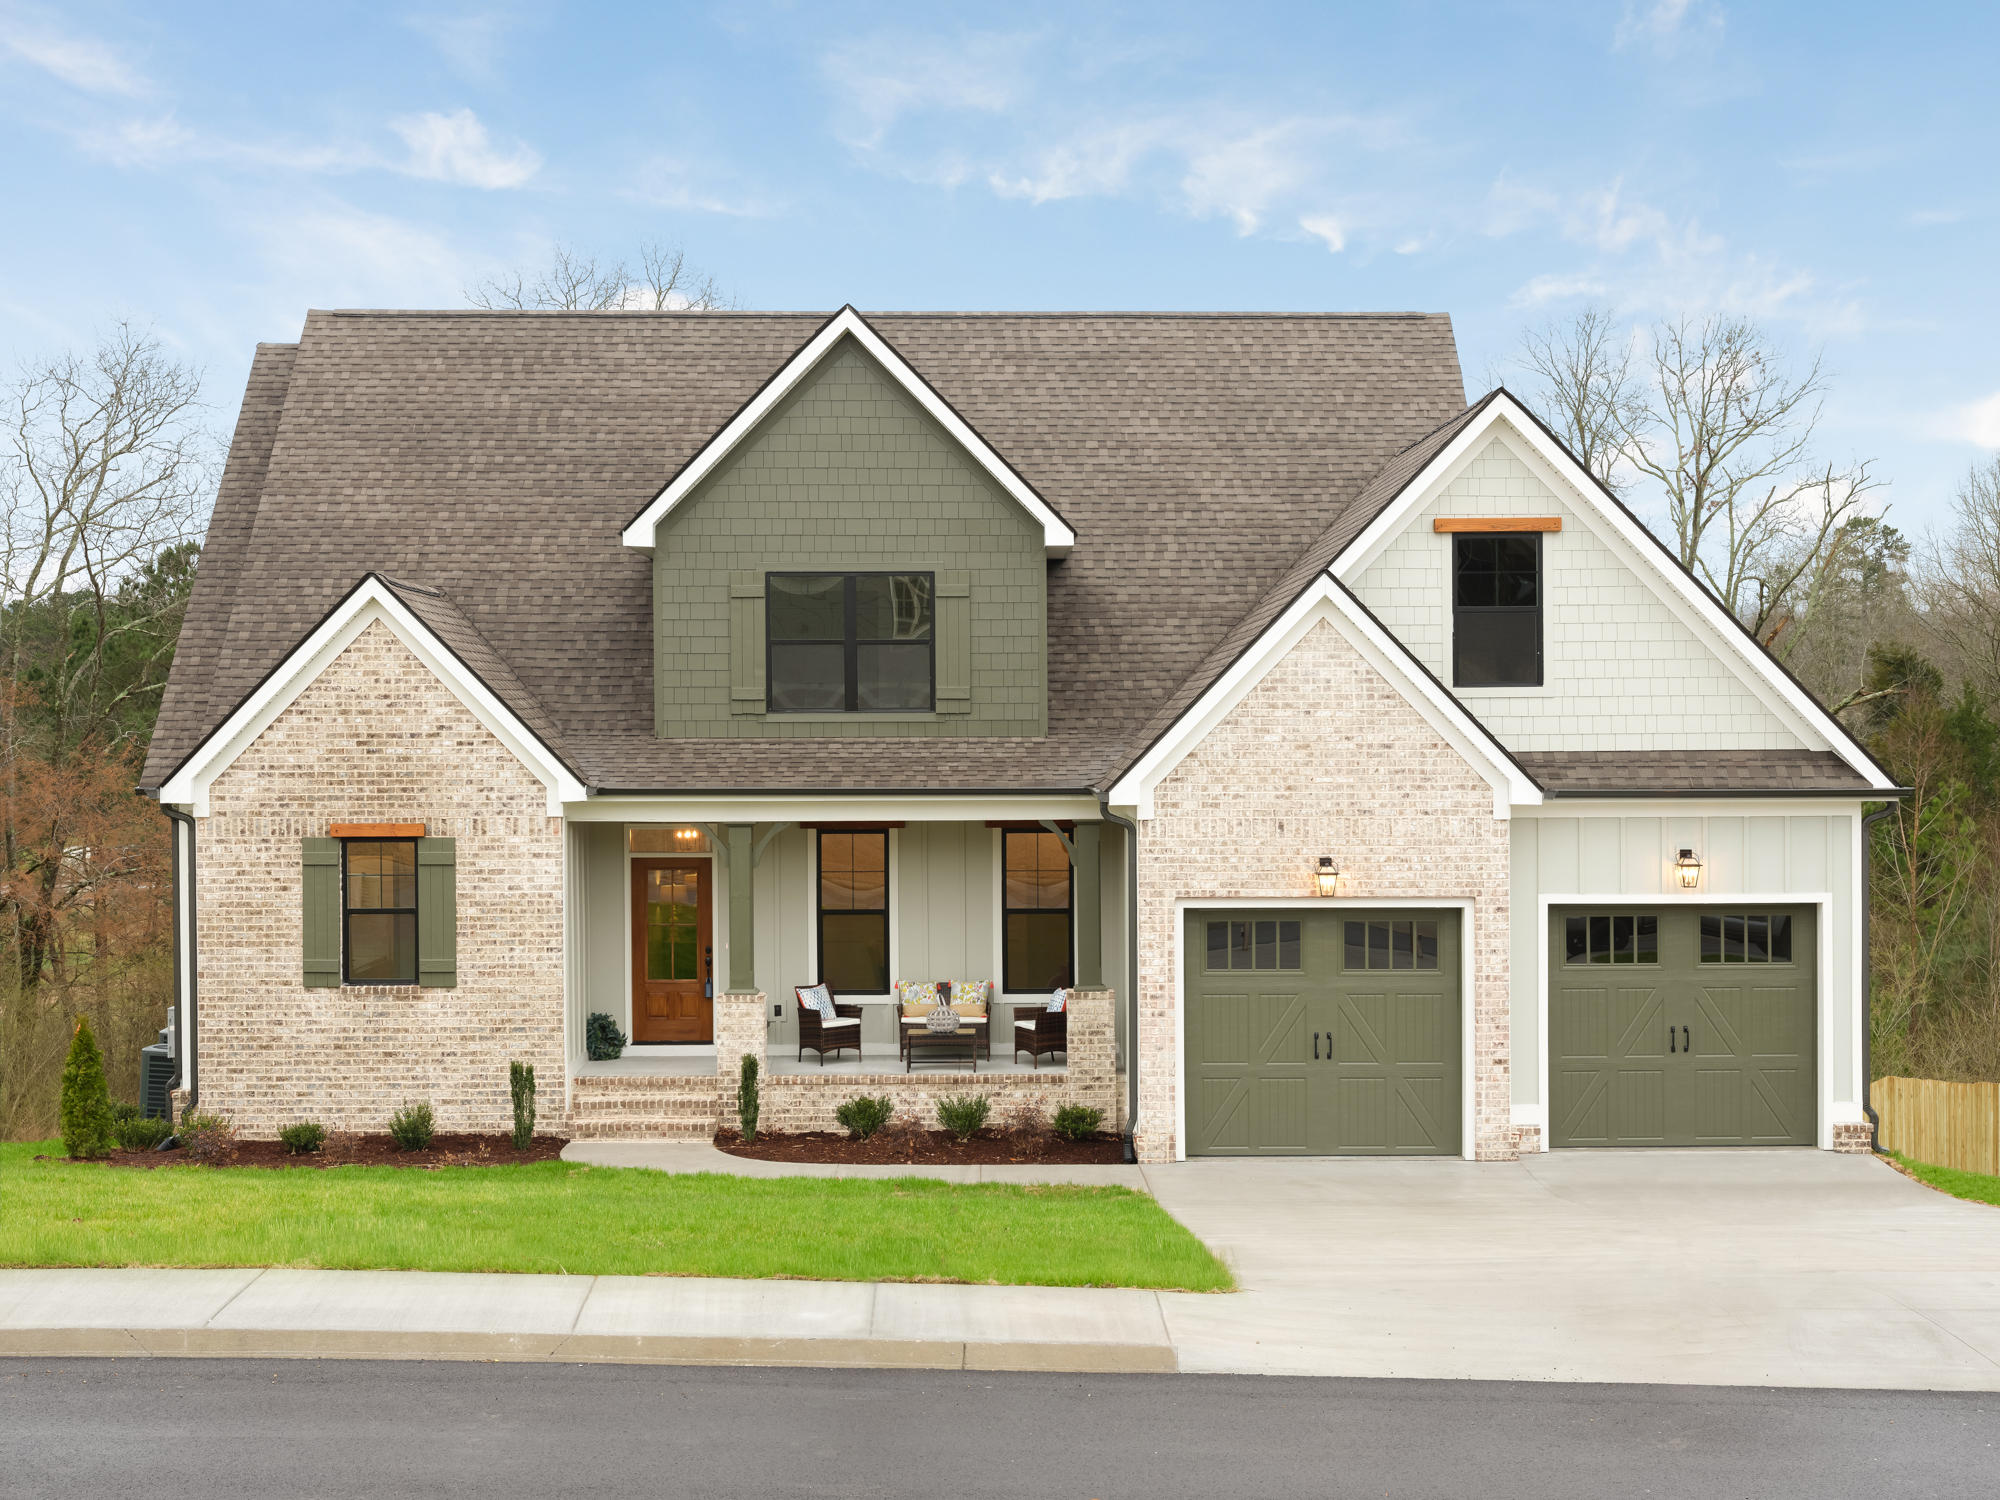 685 Live Oak Rd, Ringgold, GA 30736